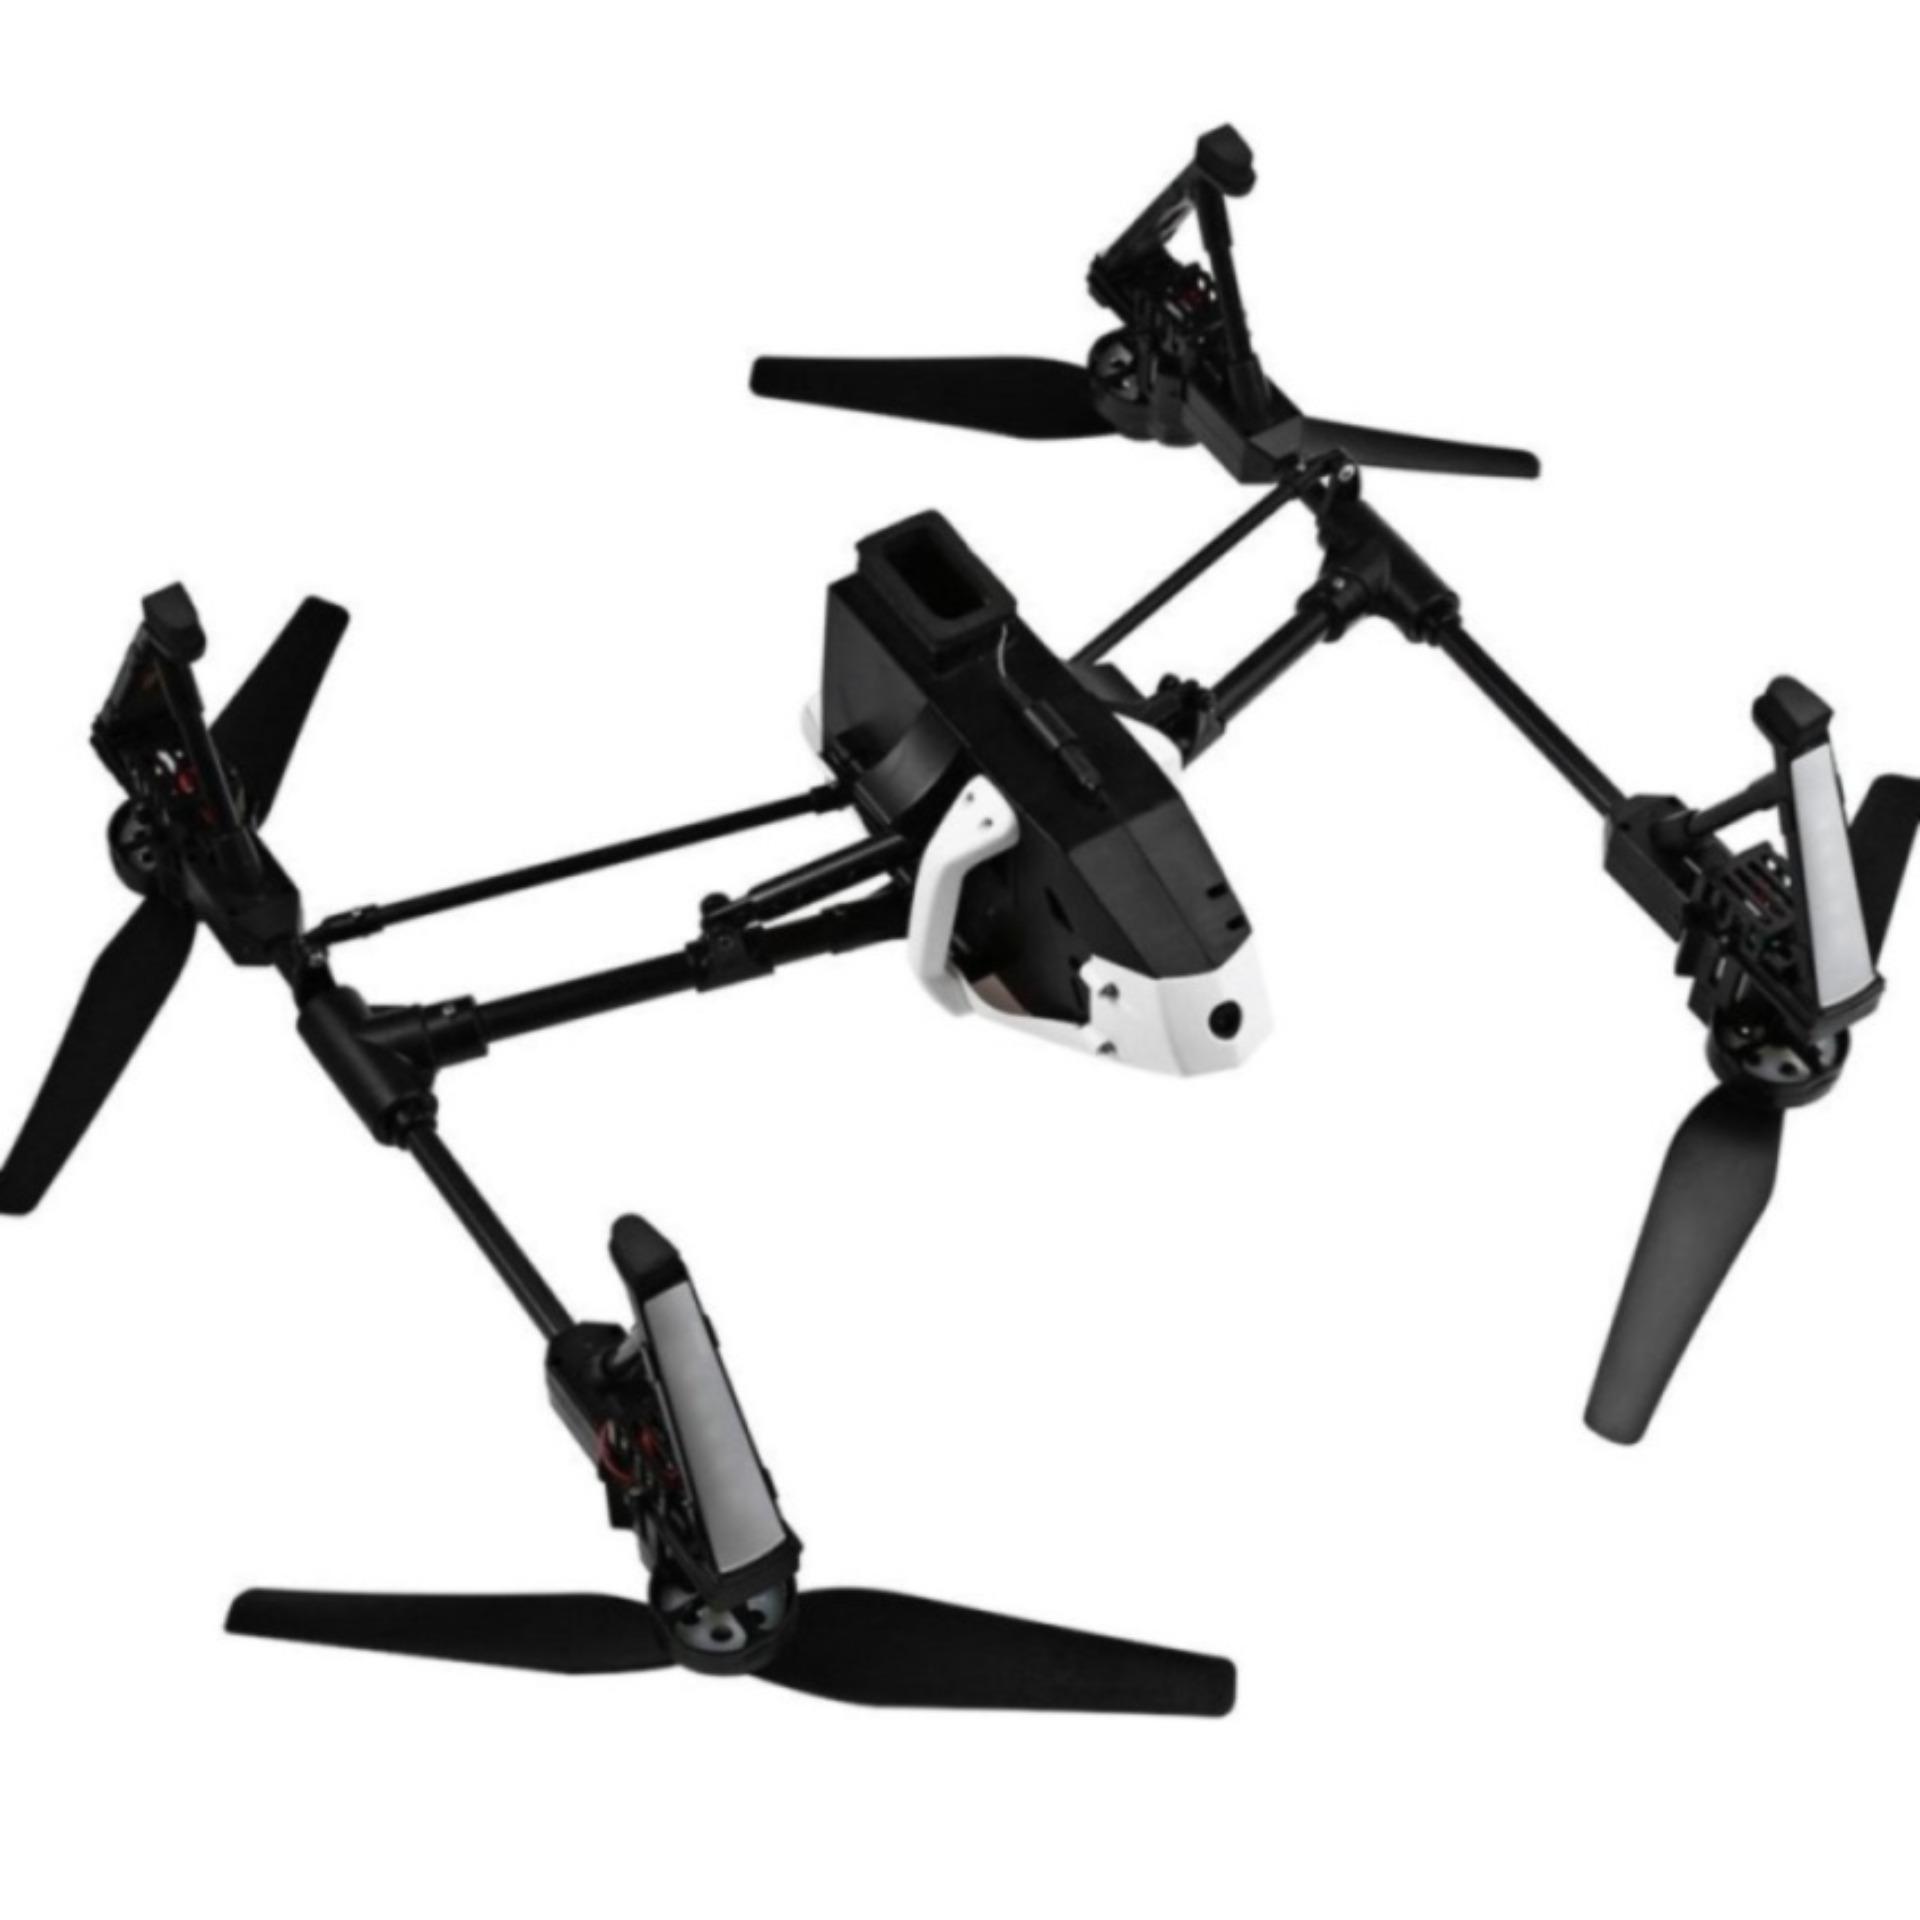 Baby DJI Inspire 1 Original Drone Q333 + Wifi Live HD Camera